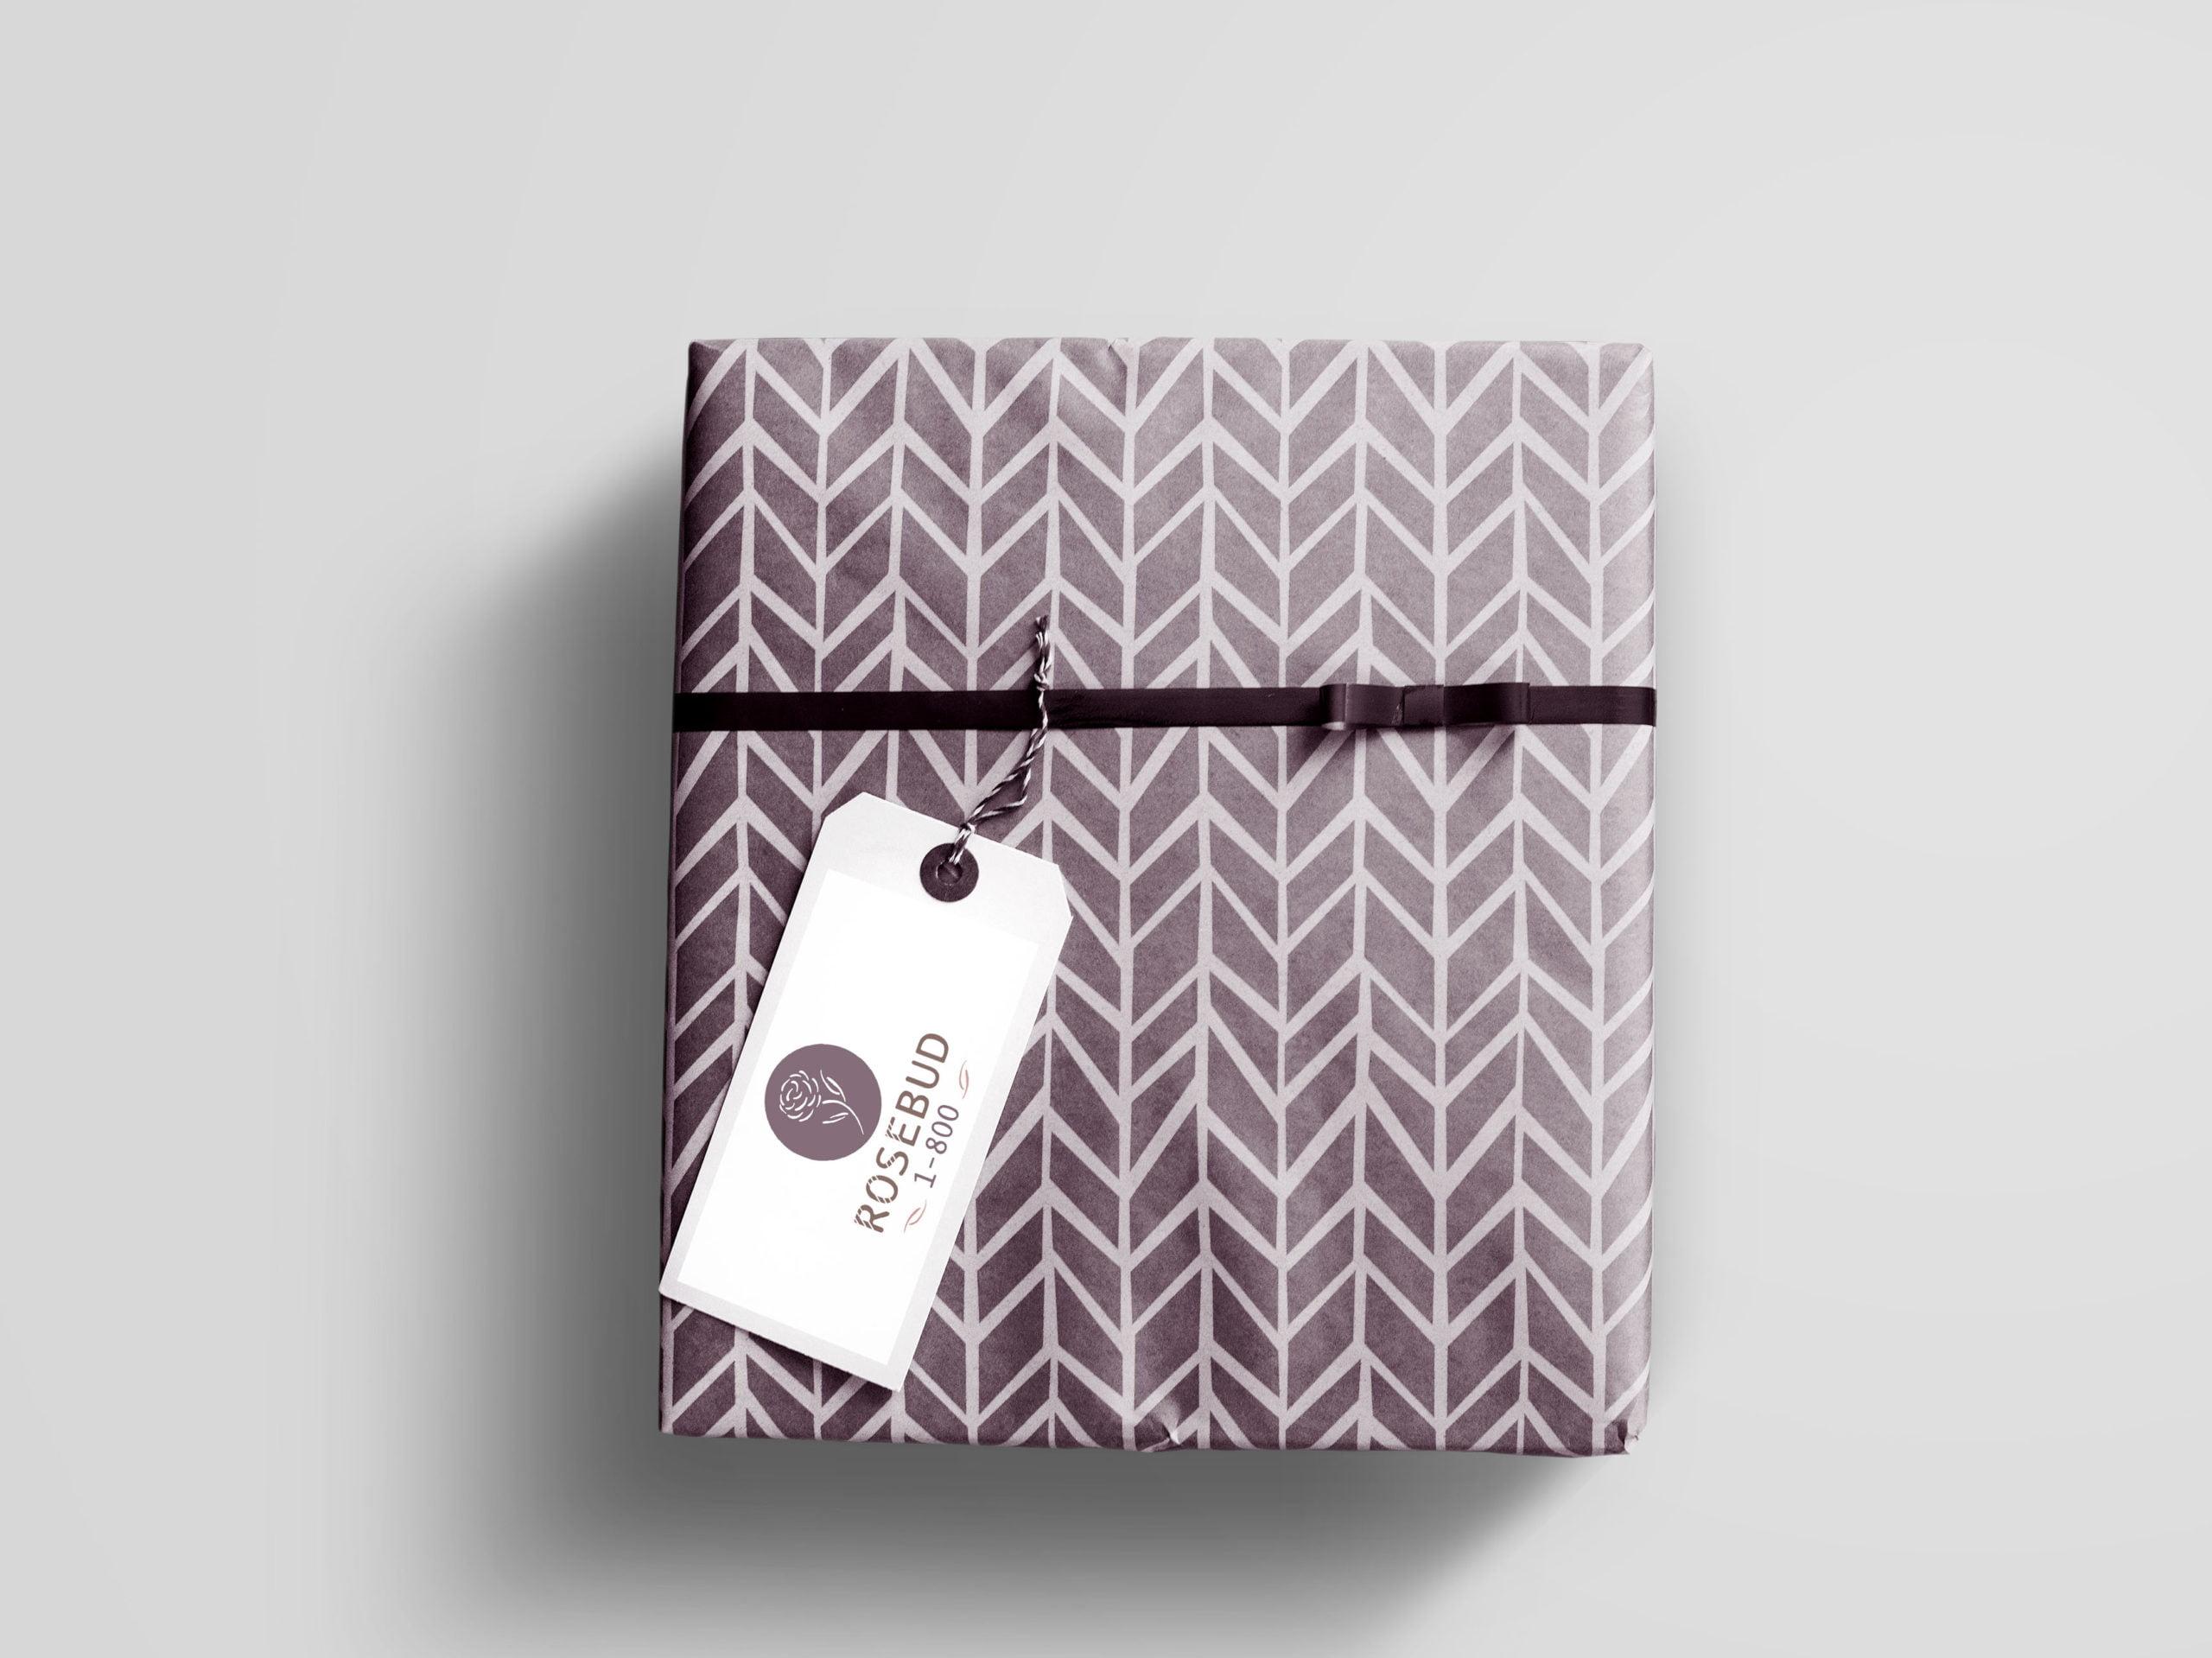 Rosebud-Logo-Geschenkverpackung